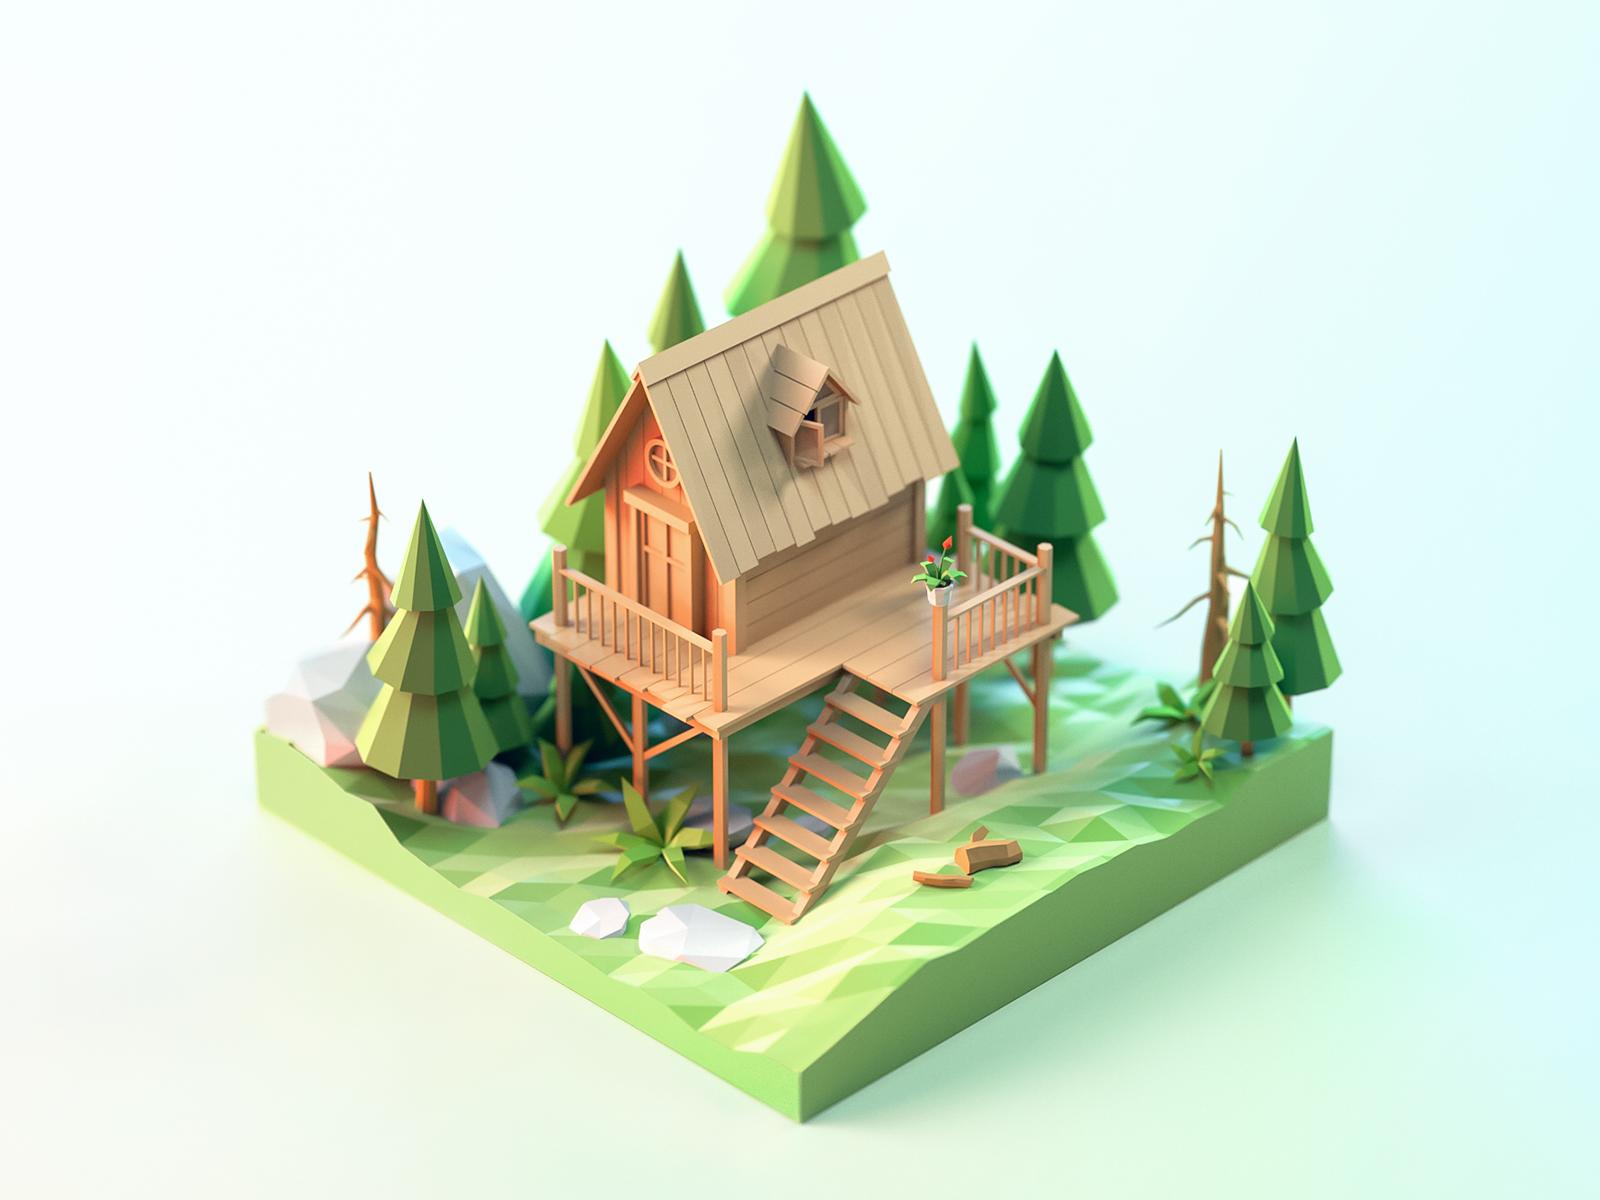 Chalet By Jzhdesigner Duckduckgoosegameonline Dessin Isometrique Paysage Jeux Video Zbrush